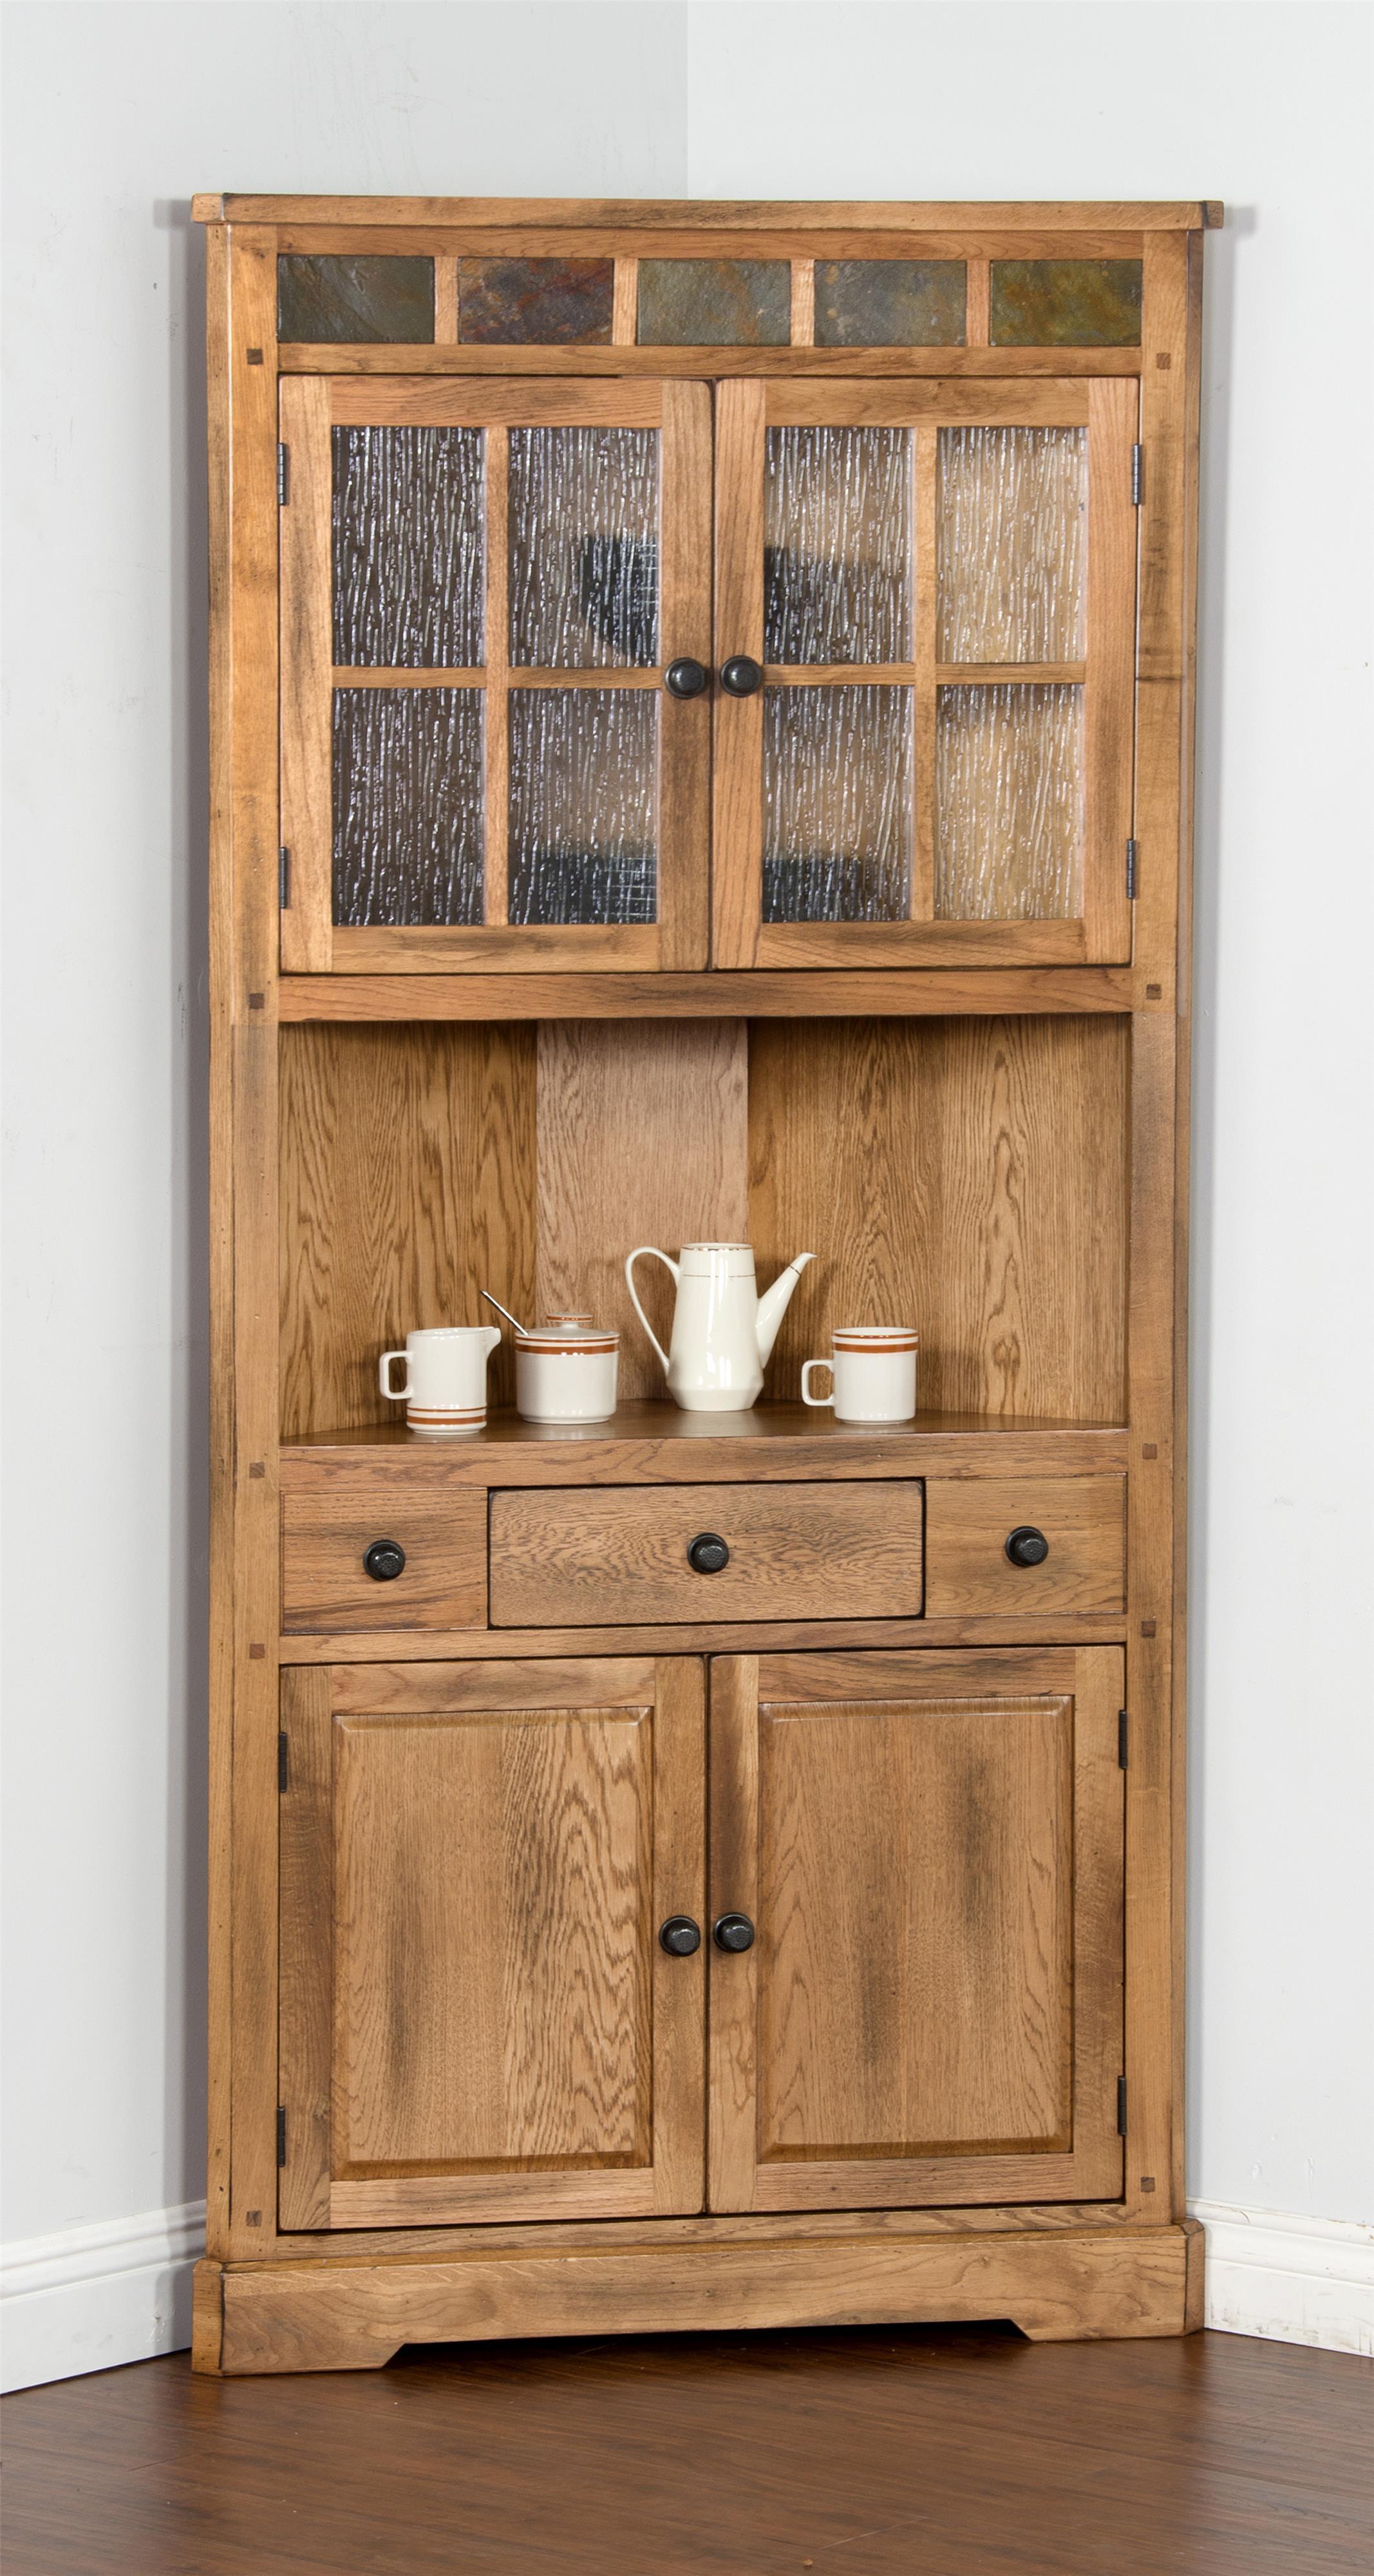 Morris Home Furnishings From Morris Home Furnishings - Oak Corner Curio Cabinet - Item Number: 385826218